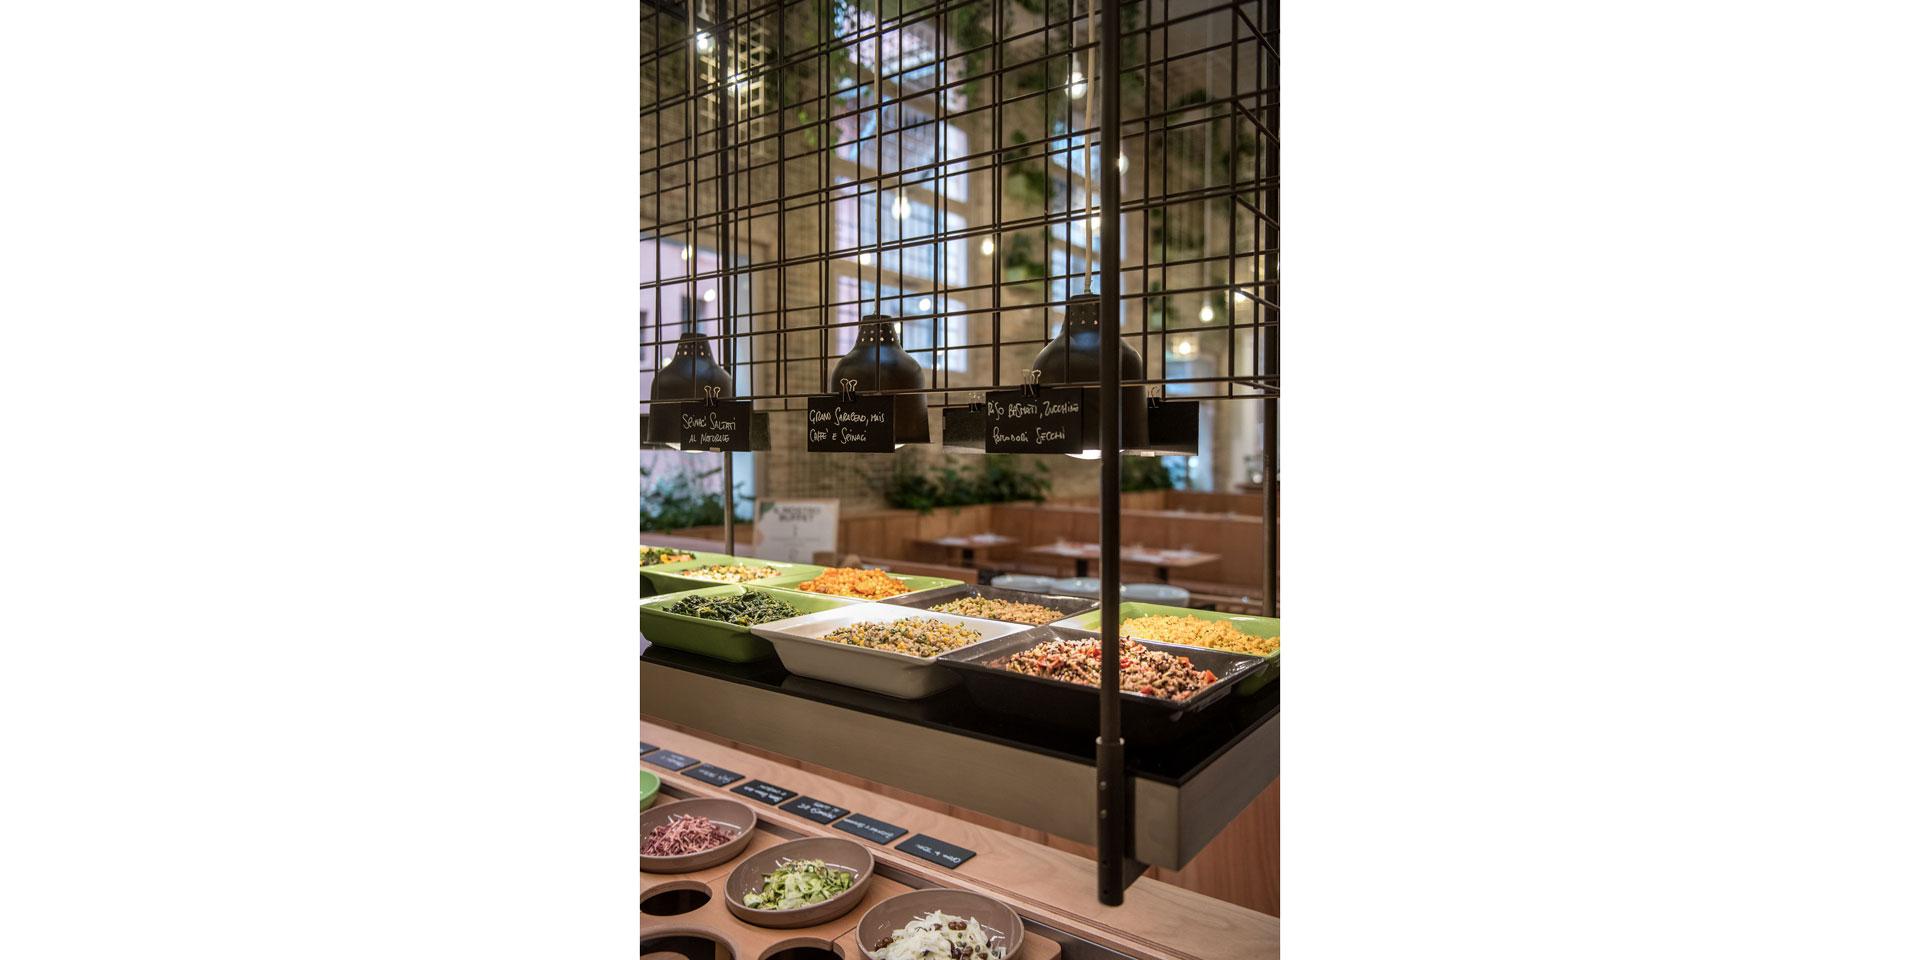 archinow_BOB_new-restaurant_11